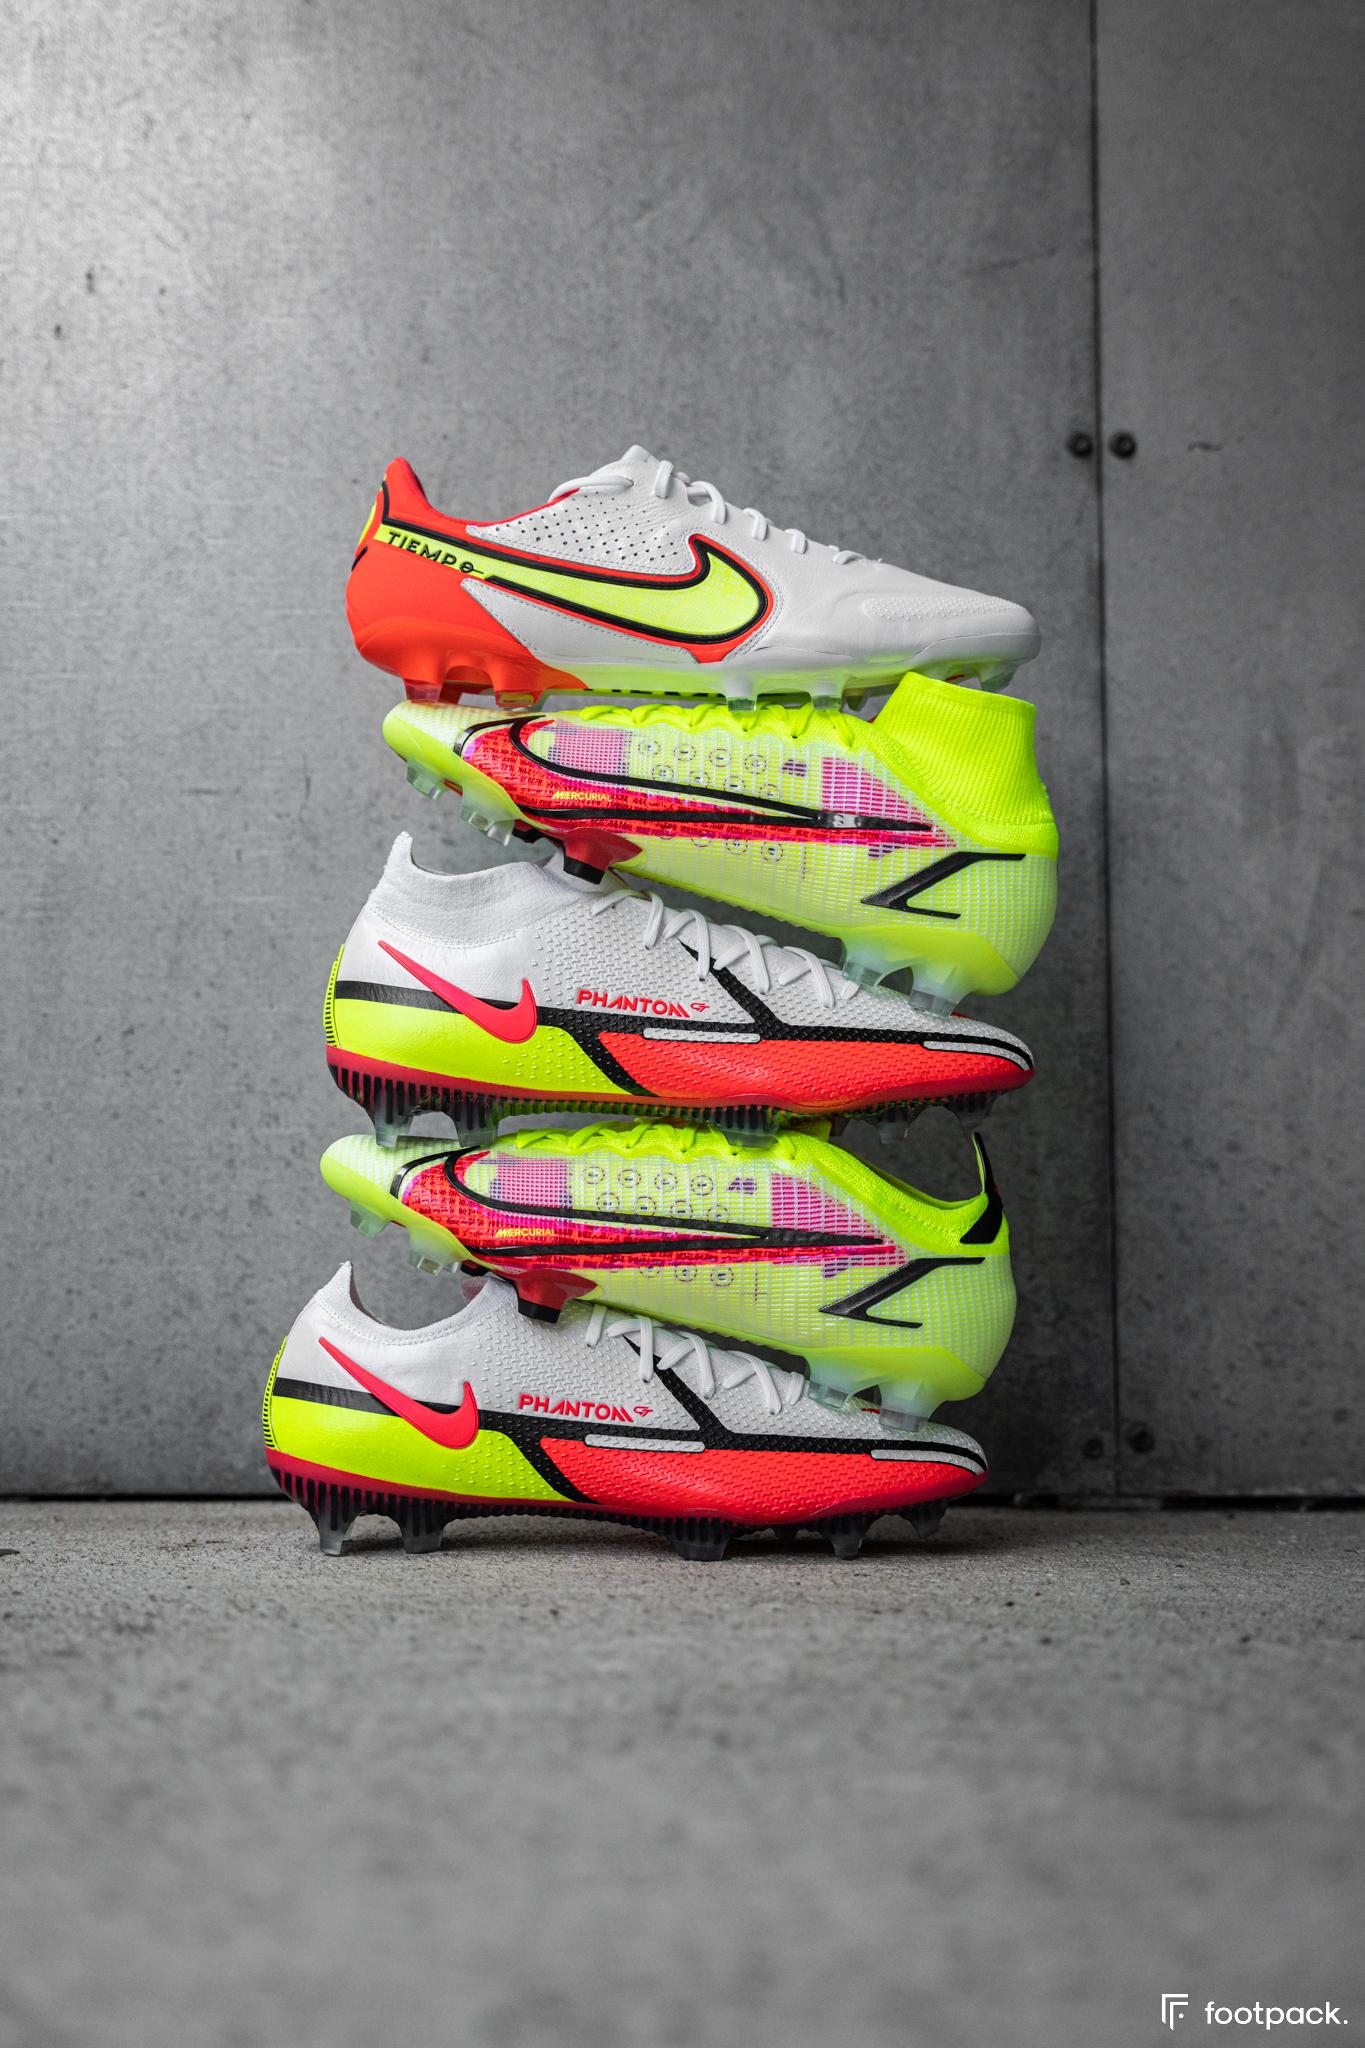 Nike Motivation Pack - footpack